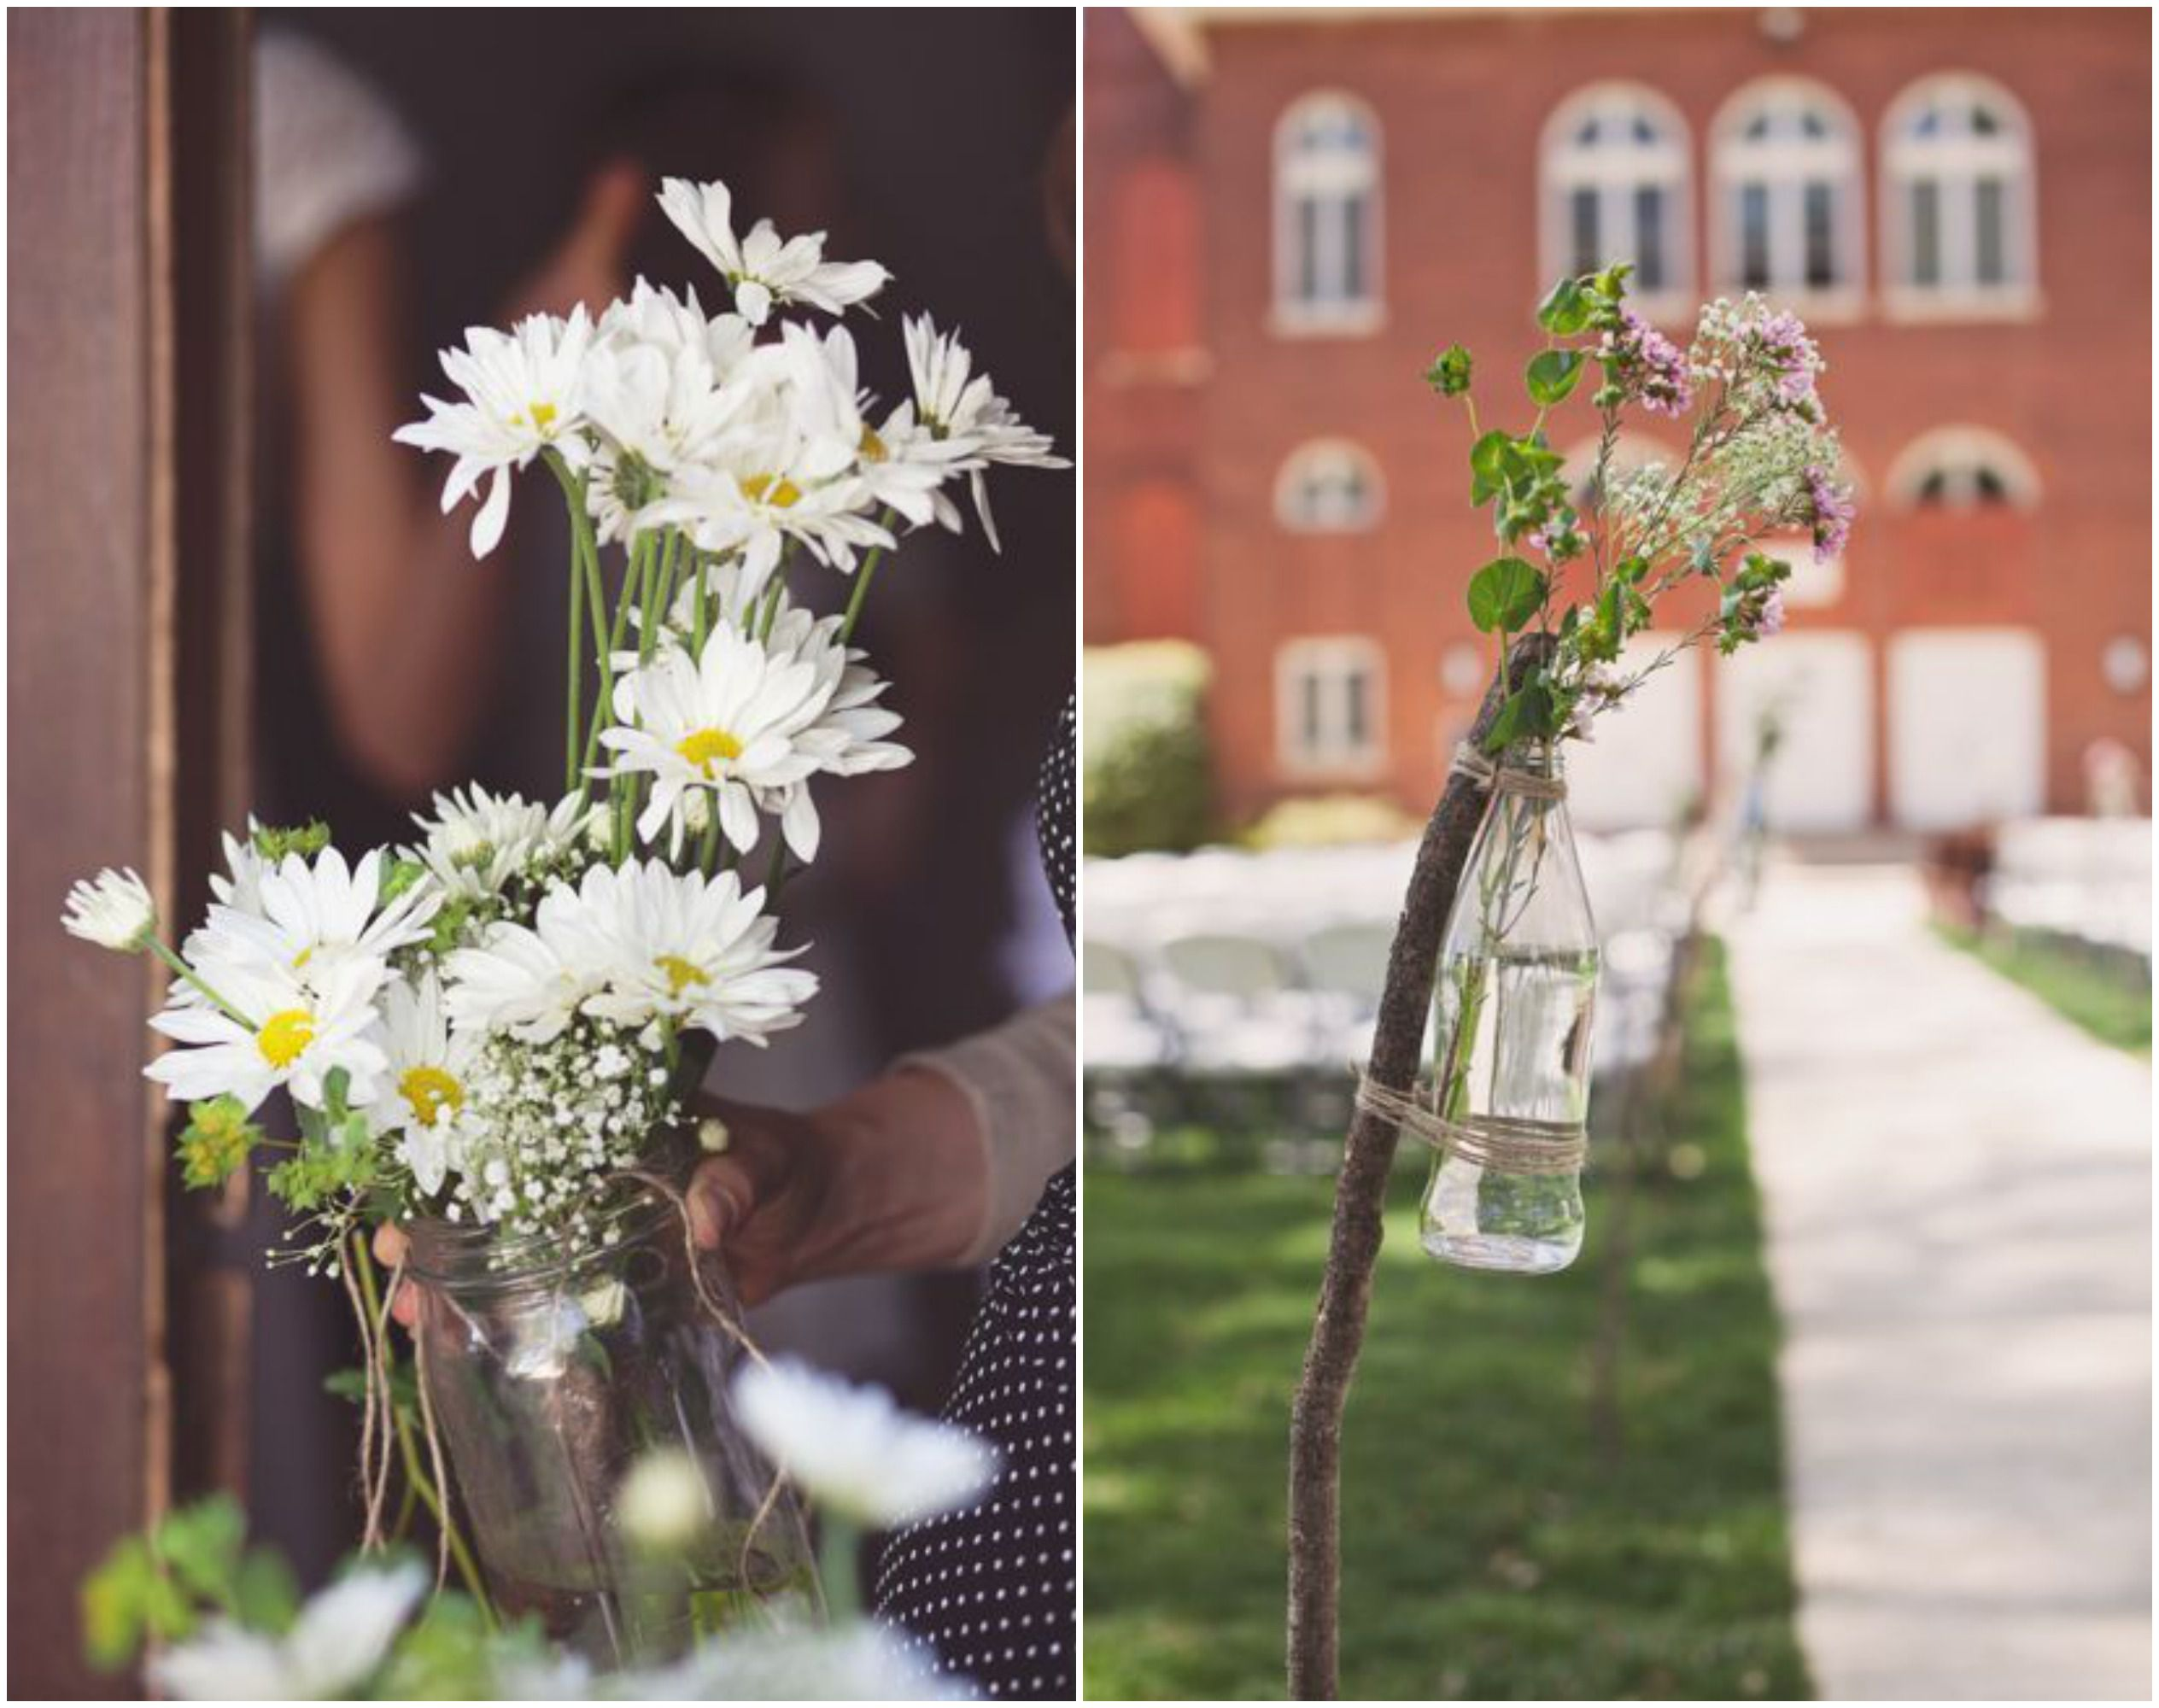 Do It Yourself Outdoor Wedding Ideas Outdoor Weddings Do: Country Rustic DIY Wedding